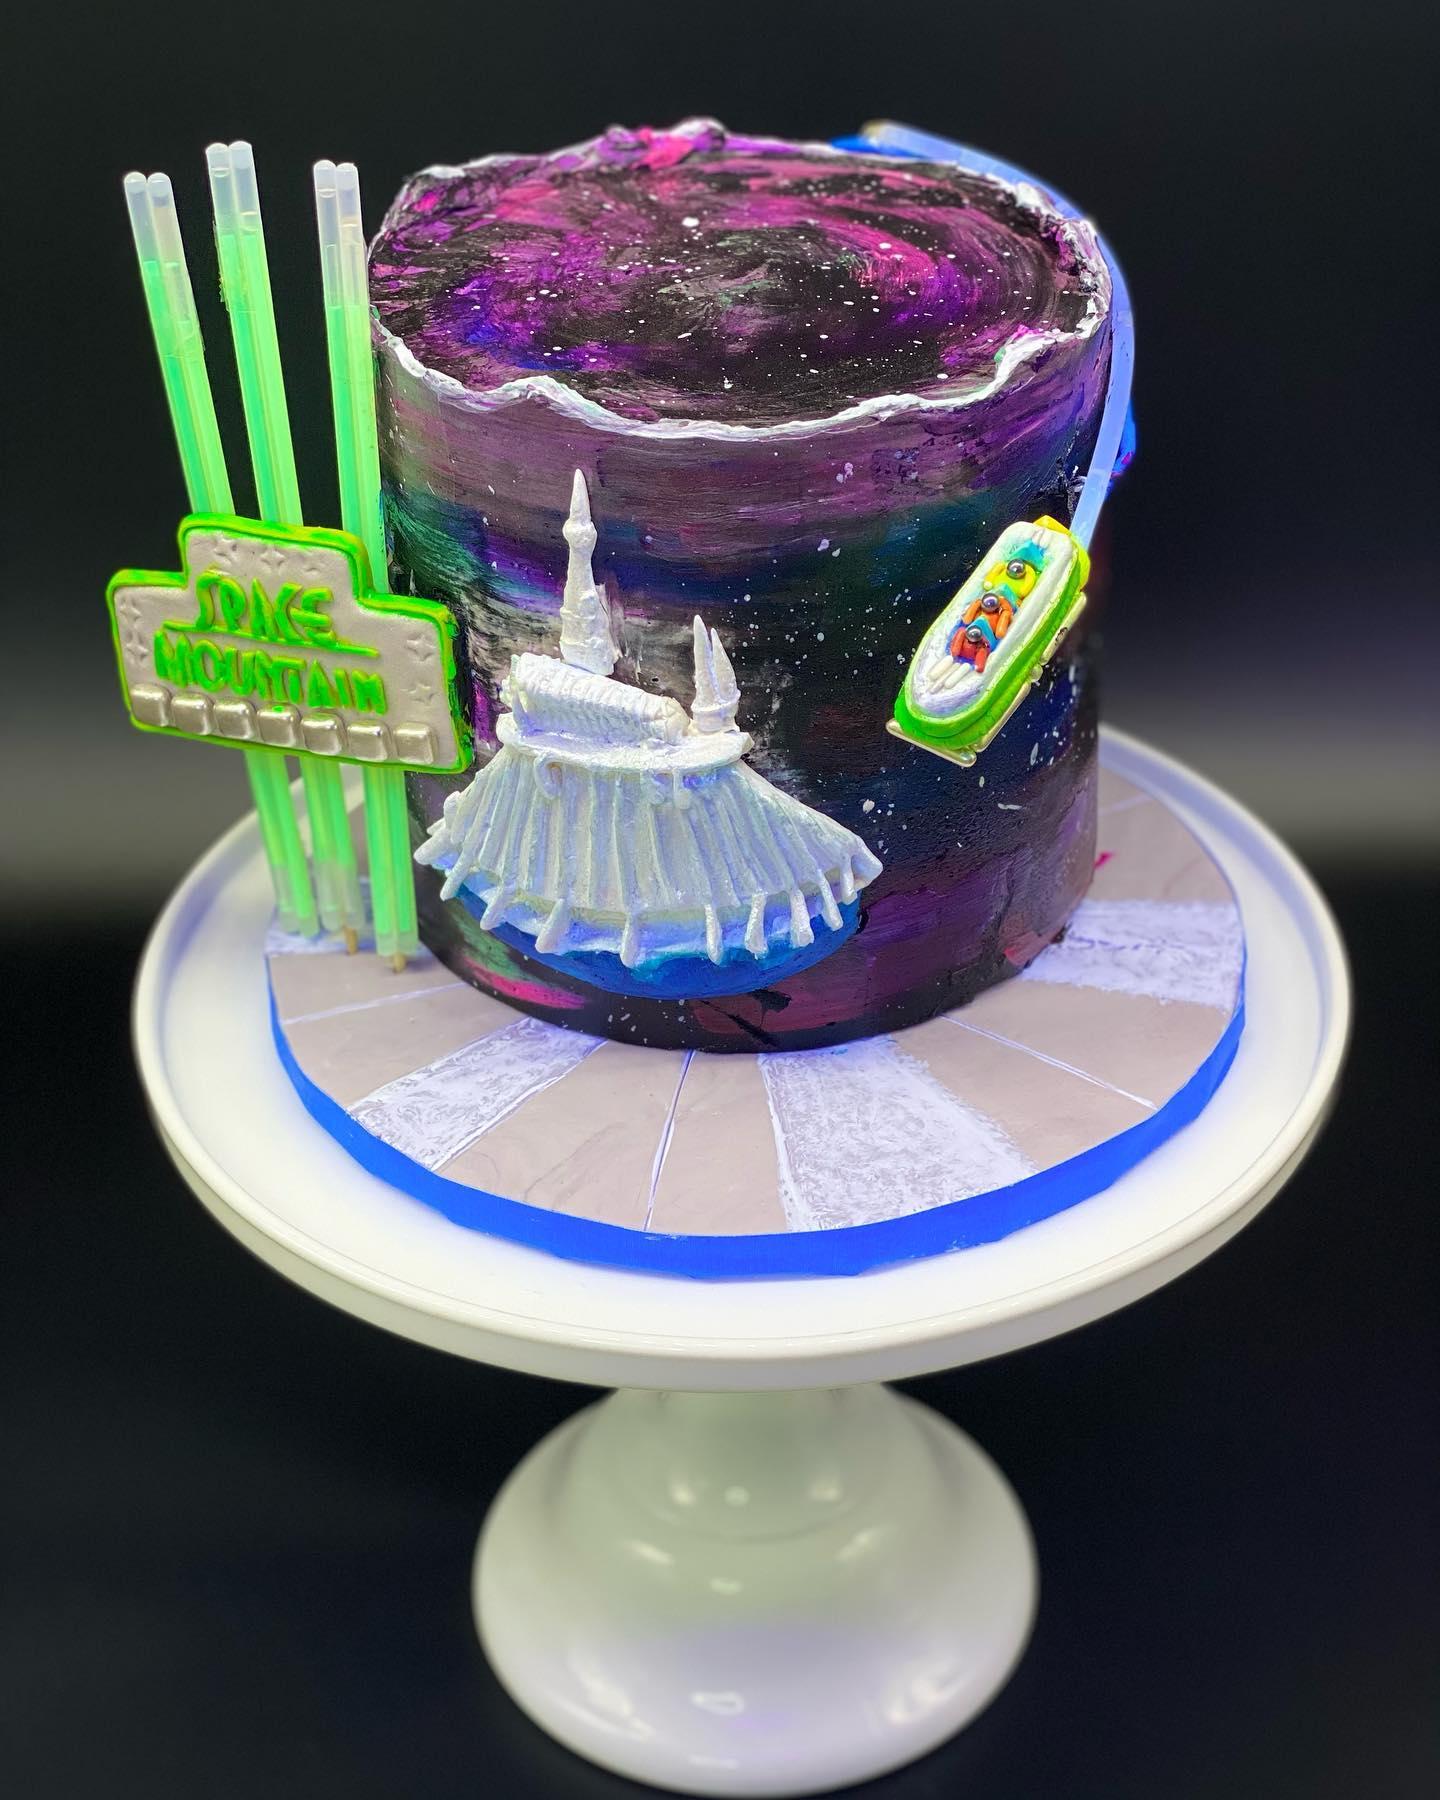 Space mountain Cake